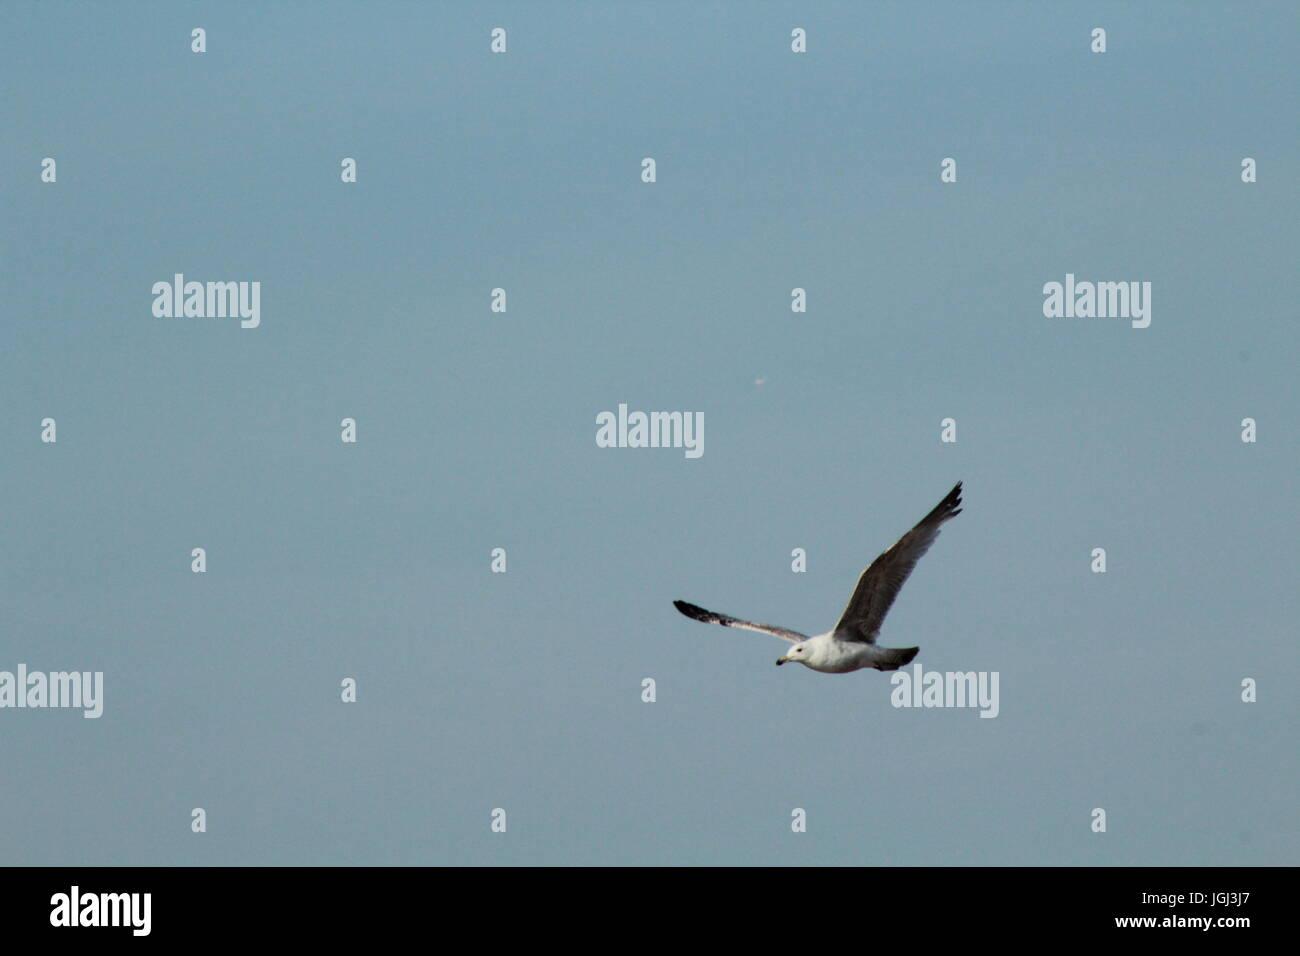 Seagull in flight in blue sky - Stock Image